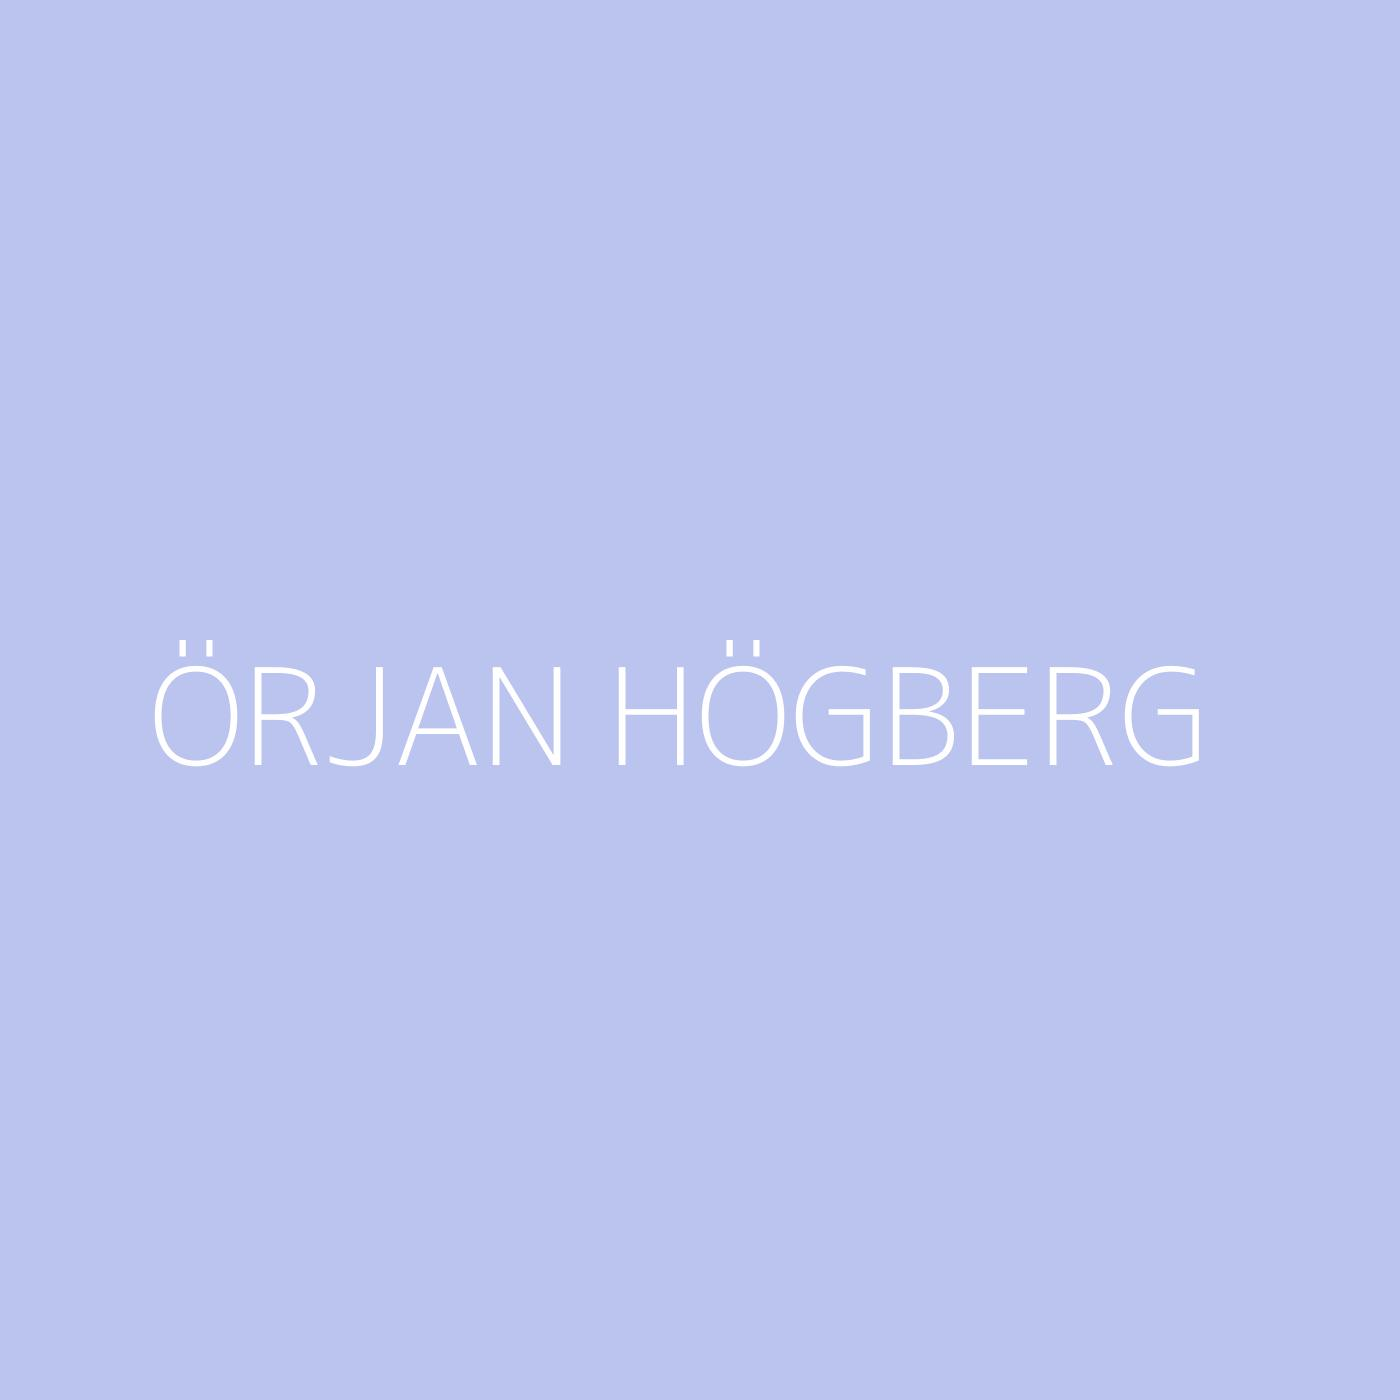 Örjan Högberg Playlist Artwork